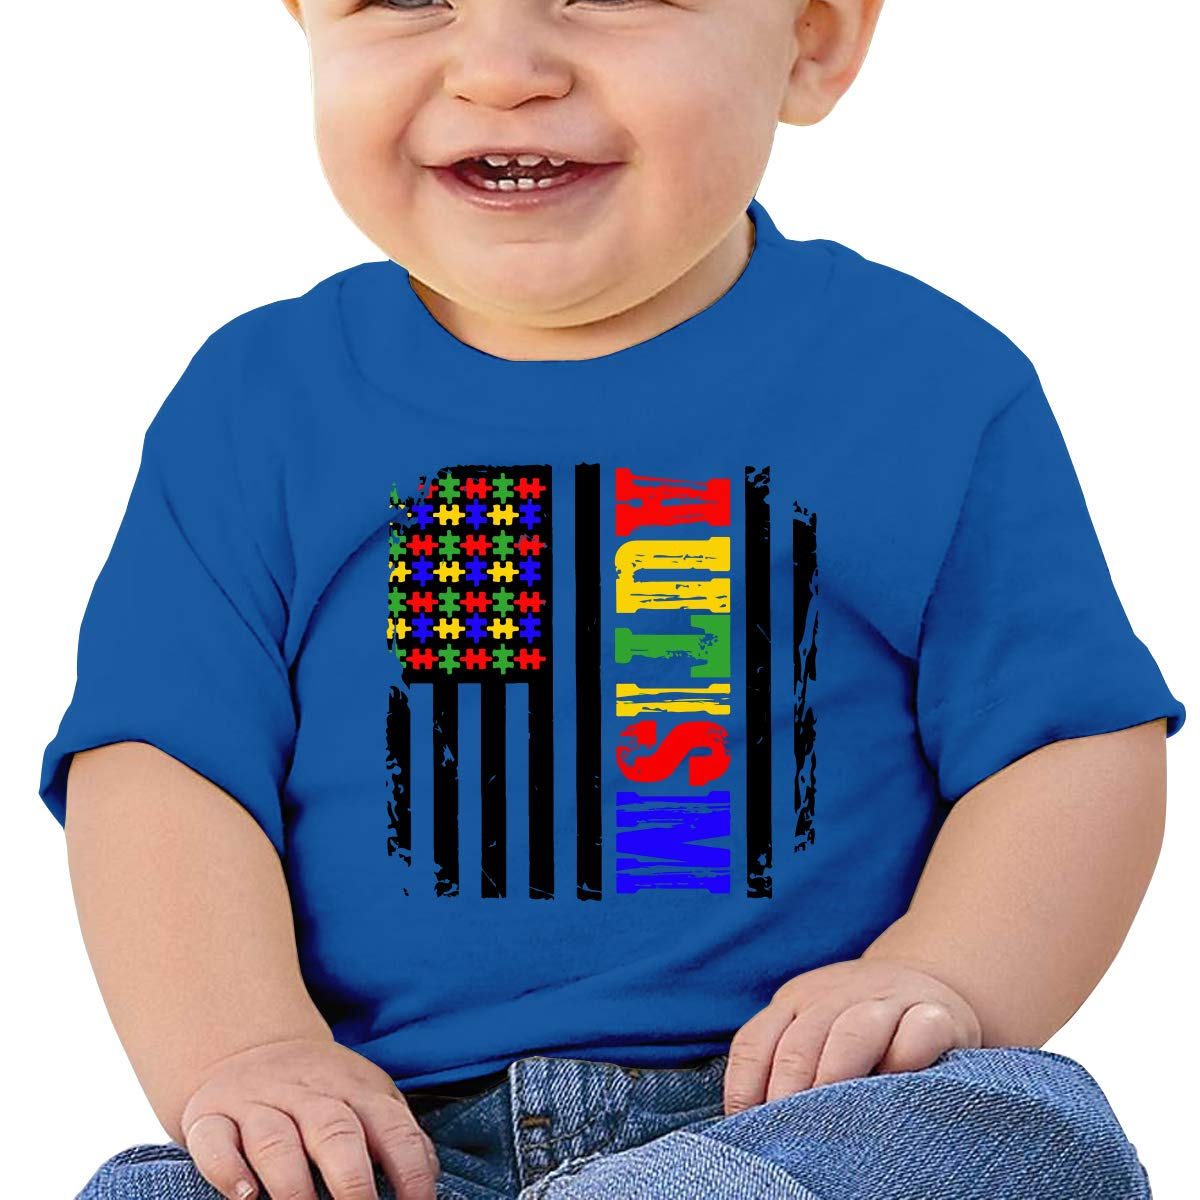 Autism Awareness American Flag1-1 Newborn Baby Short Sleeve Crewneck T Shirts 6-18 Month Tops